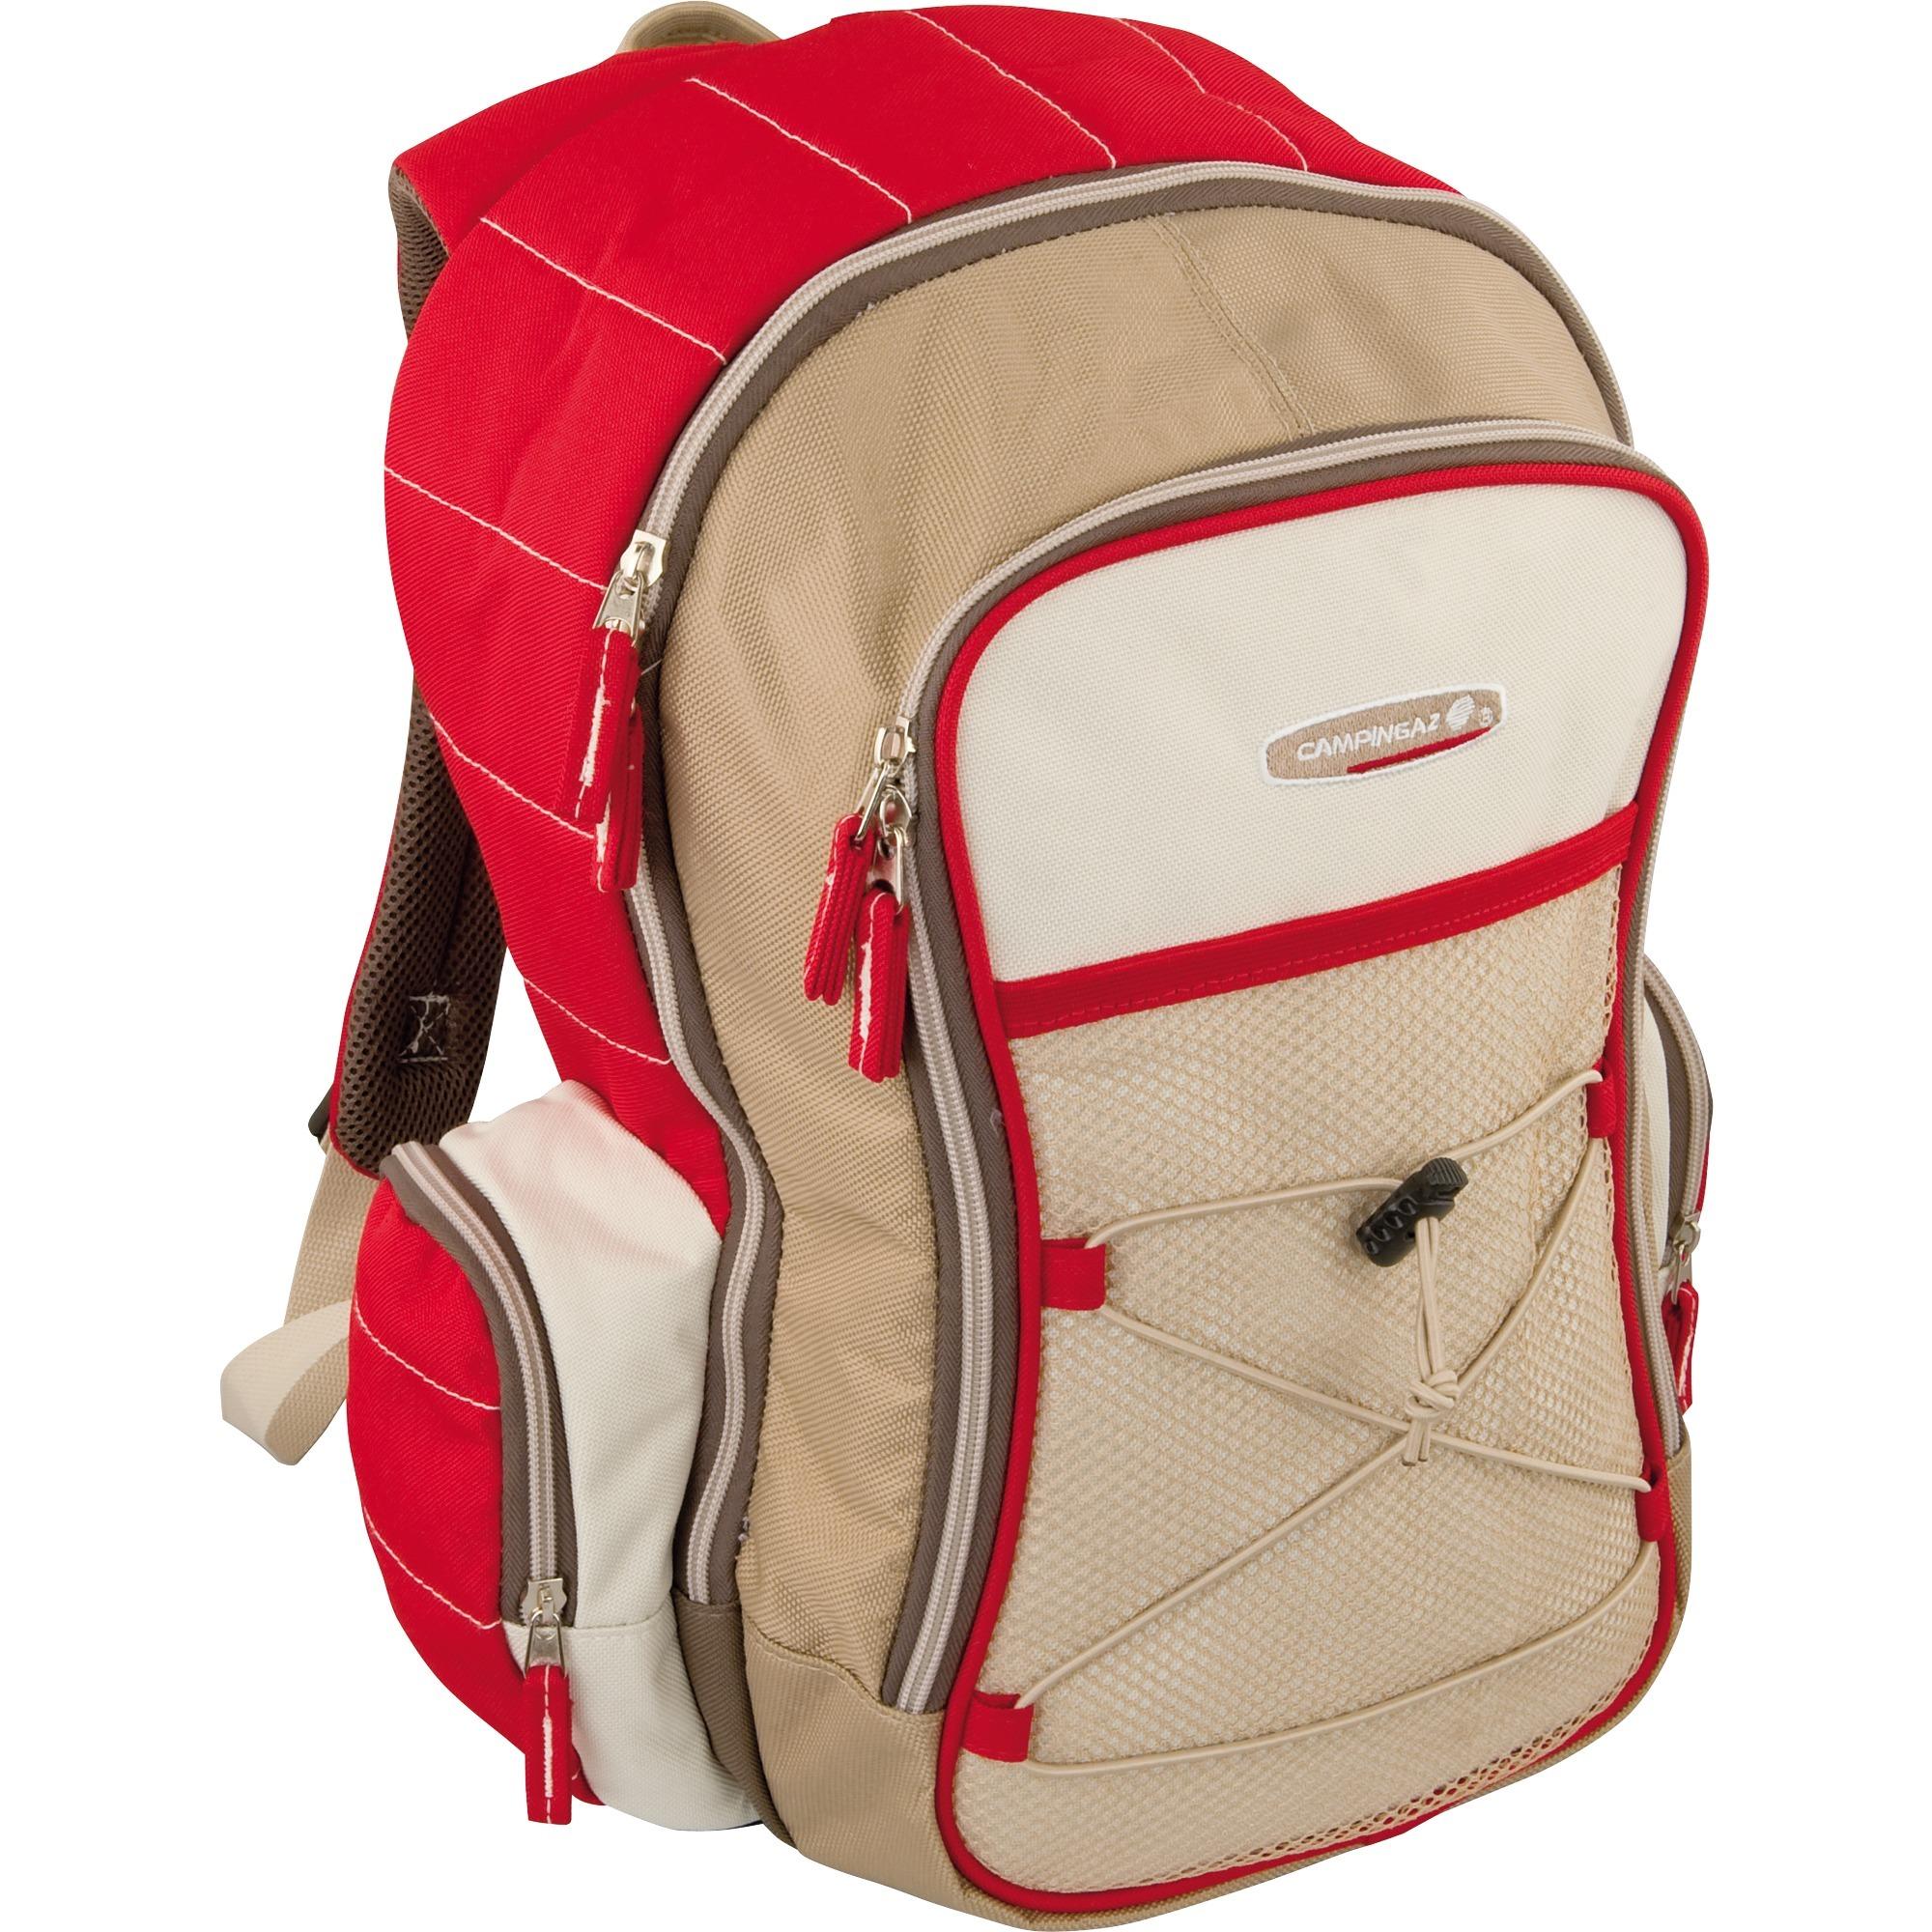 picnic-cusco-15l-nylonpolyester-rod-rygsak-cooler-bag